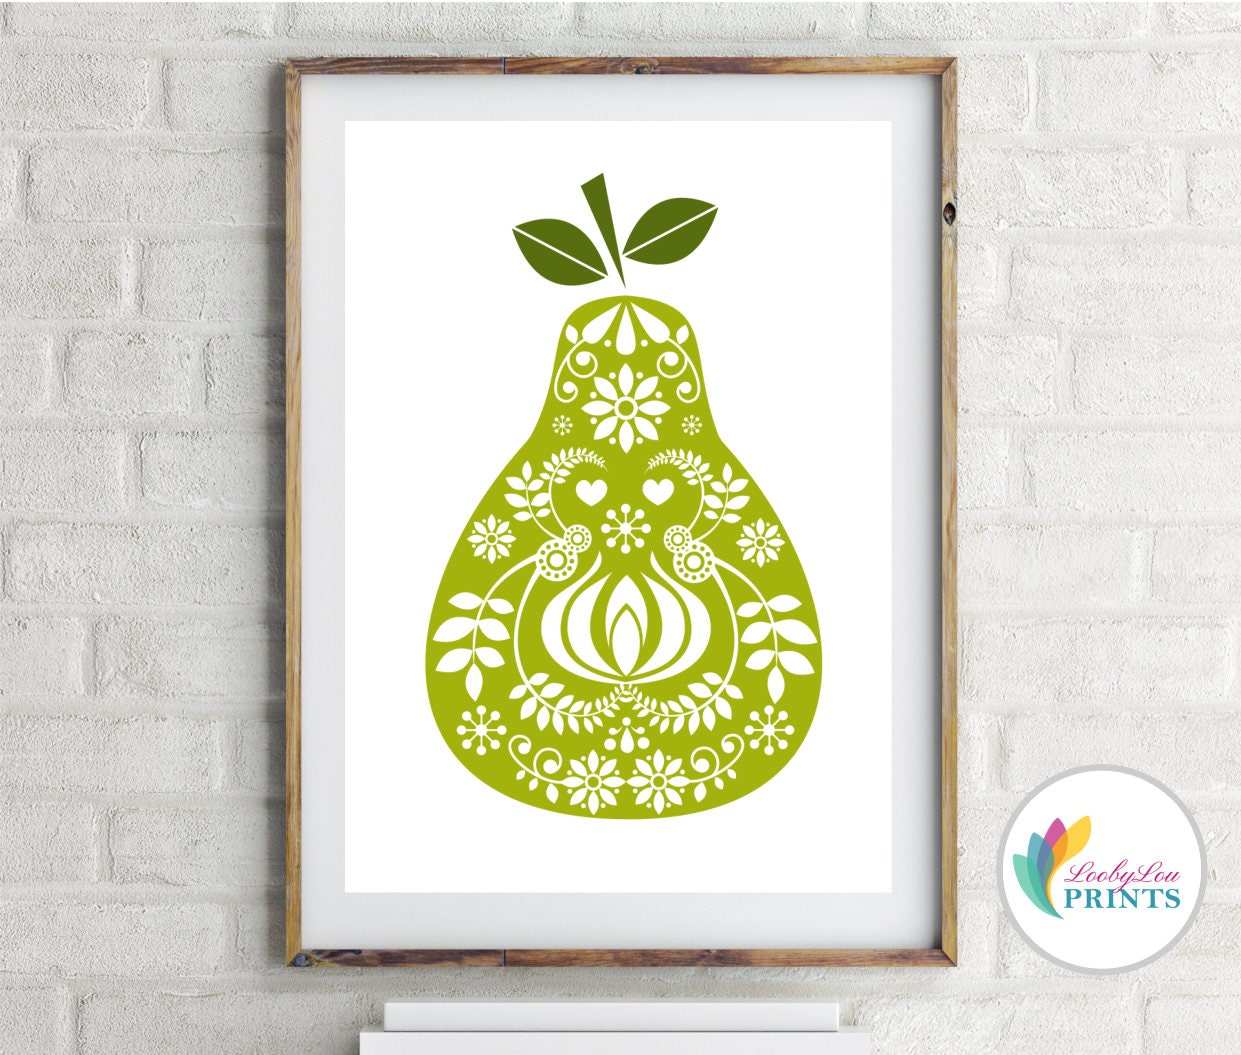 Pear Print Scandinavian Design Pear Mid-Century Design